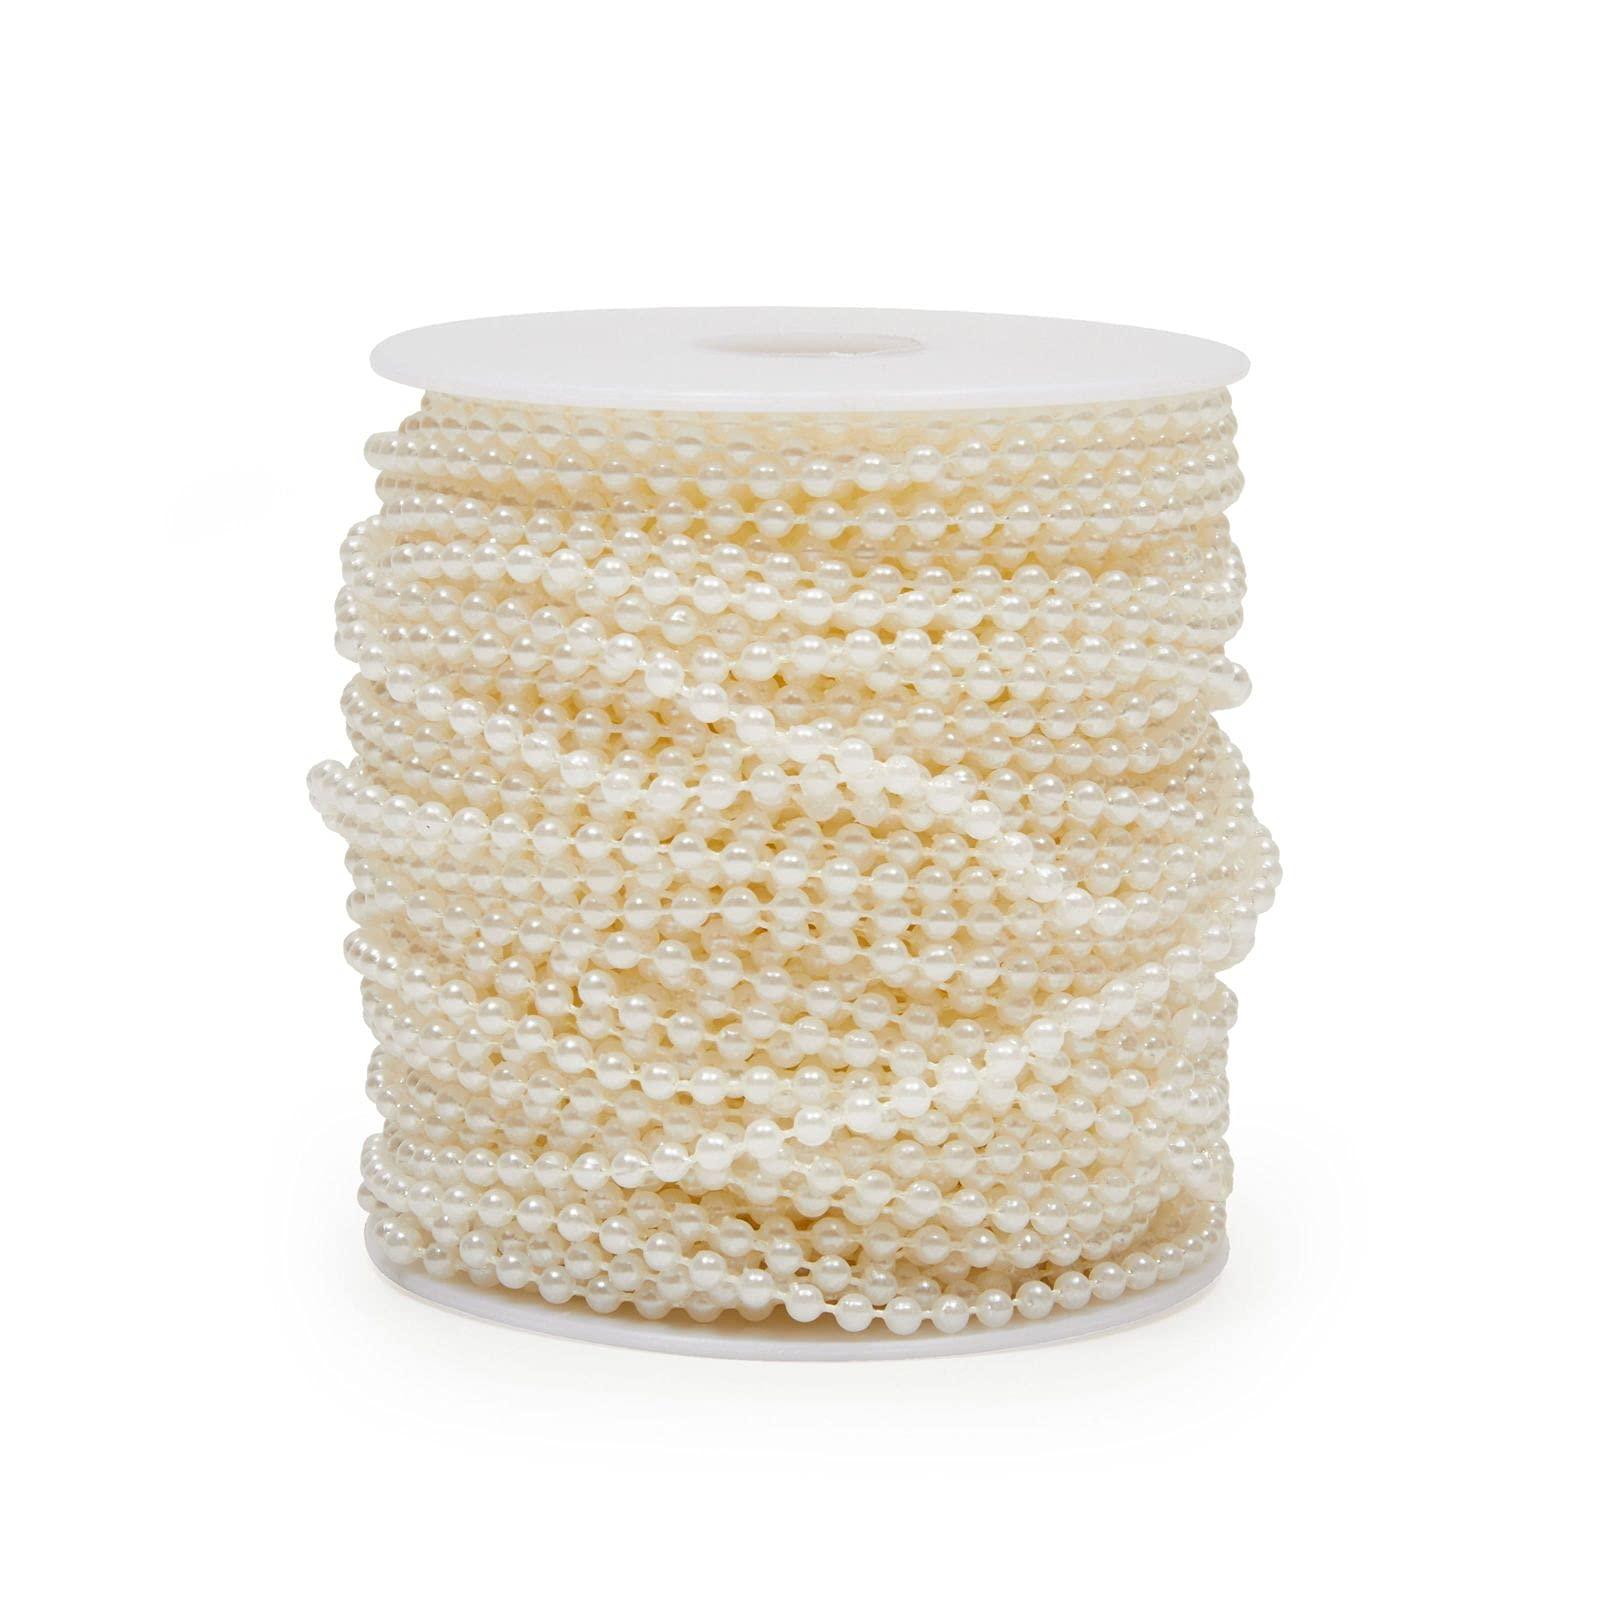 Pearl Garland, Round Bead Trim Spool for DIY Crafts (3mm x 33 Yards)